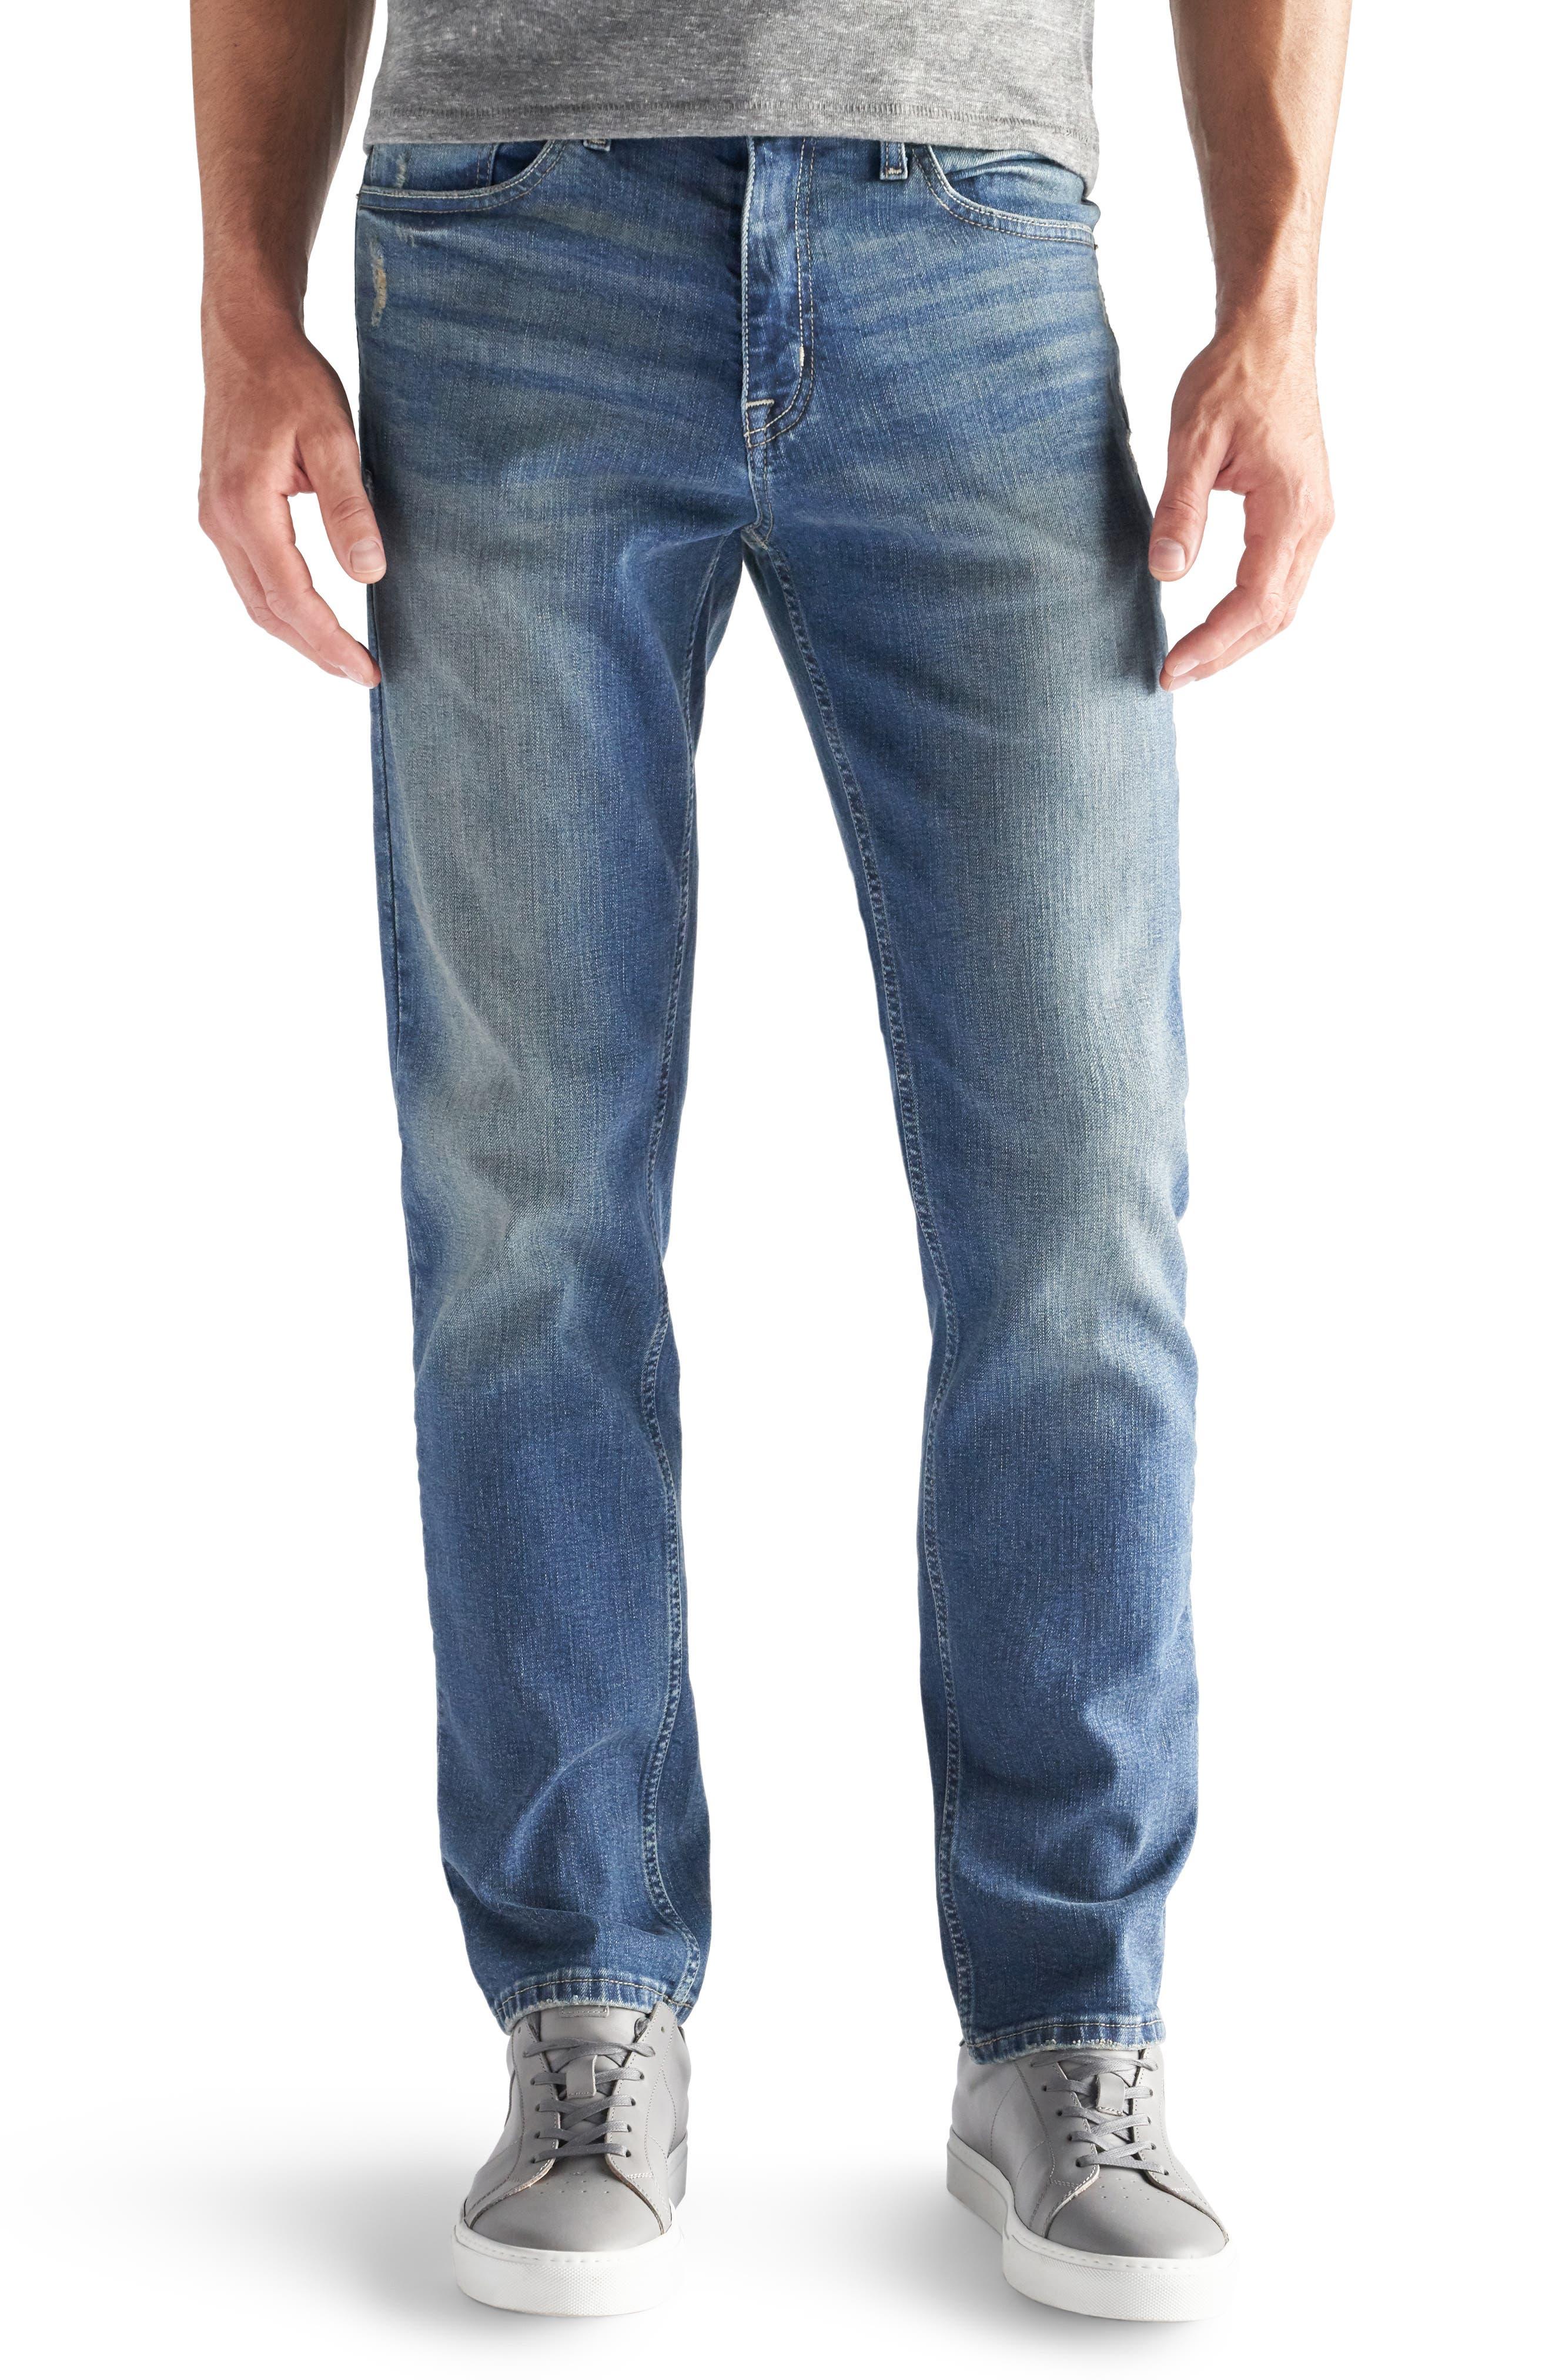 "DEVIL-DOG DUNGAREES Slim Straight Fit Jeans - 30-34"" Inseam"